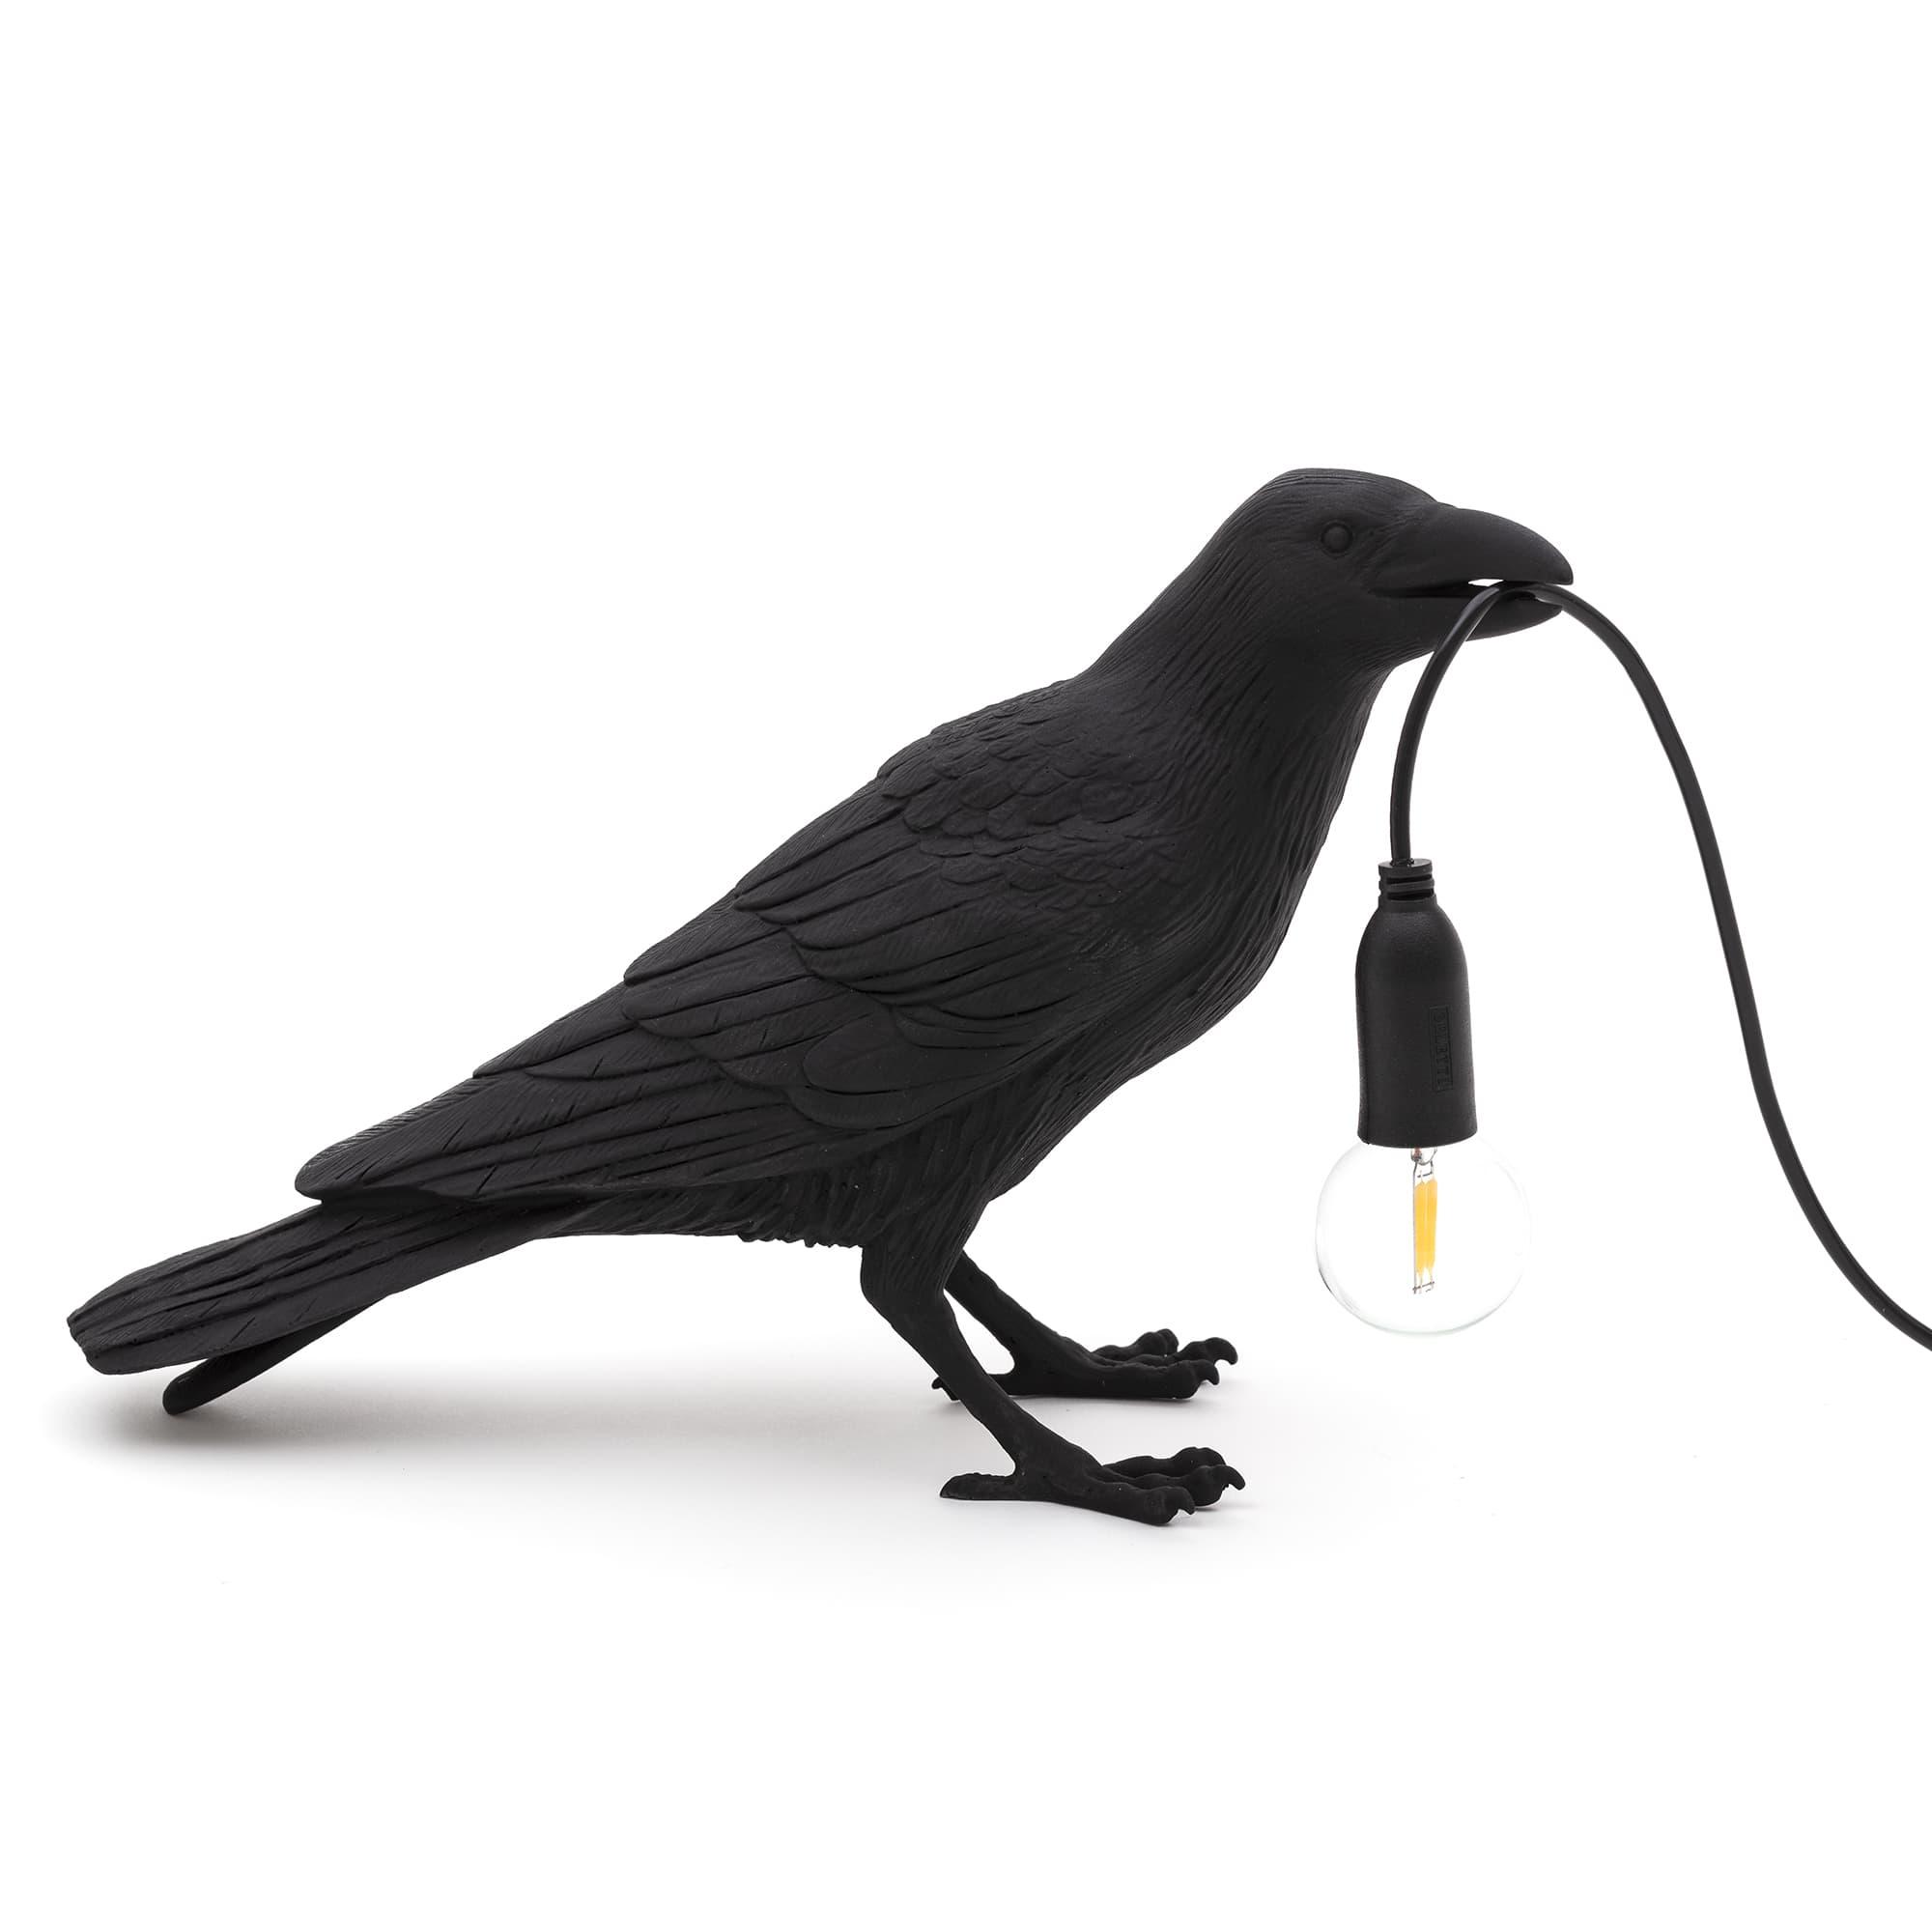 Seletti - Bird Lamp Black Waiting